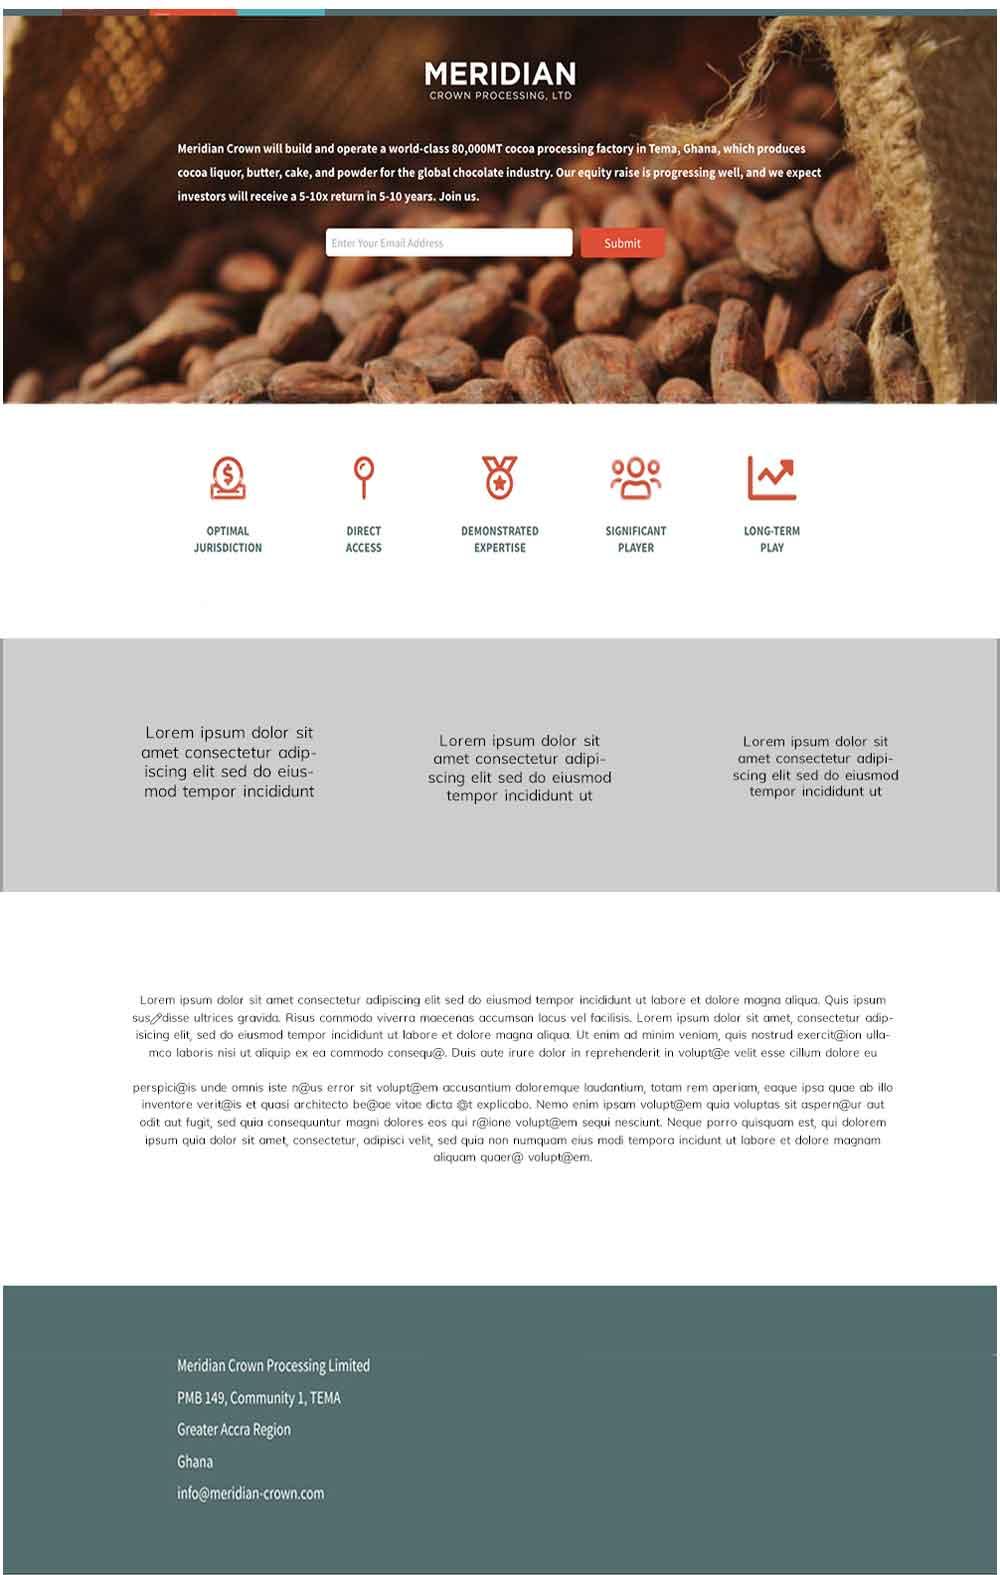 Meridian Cocoa